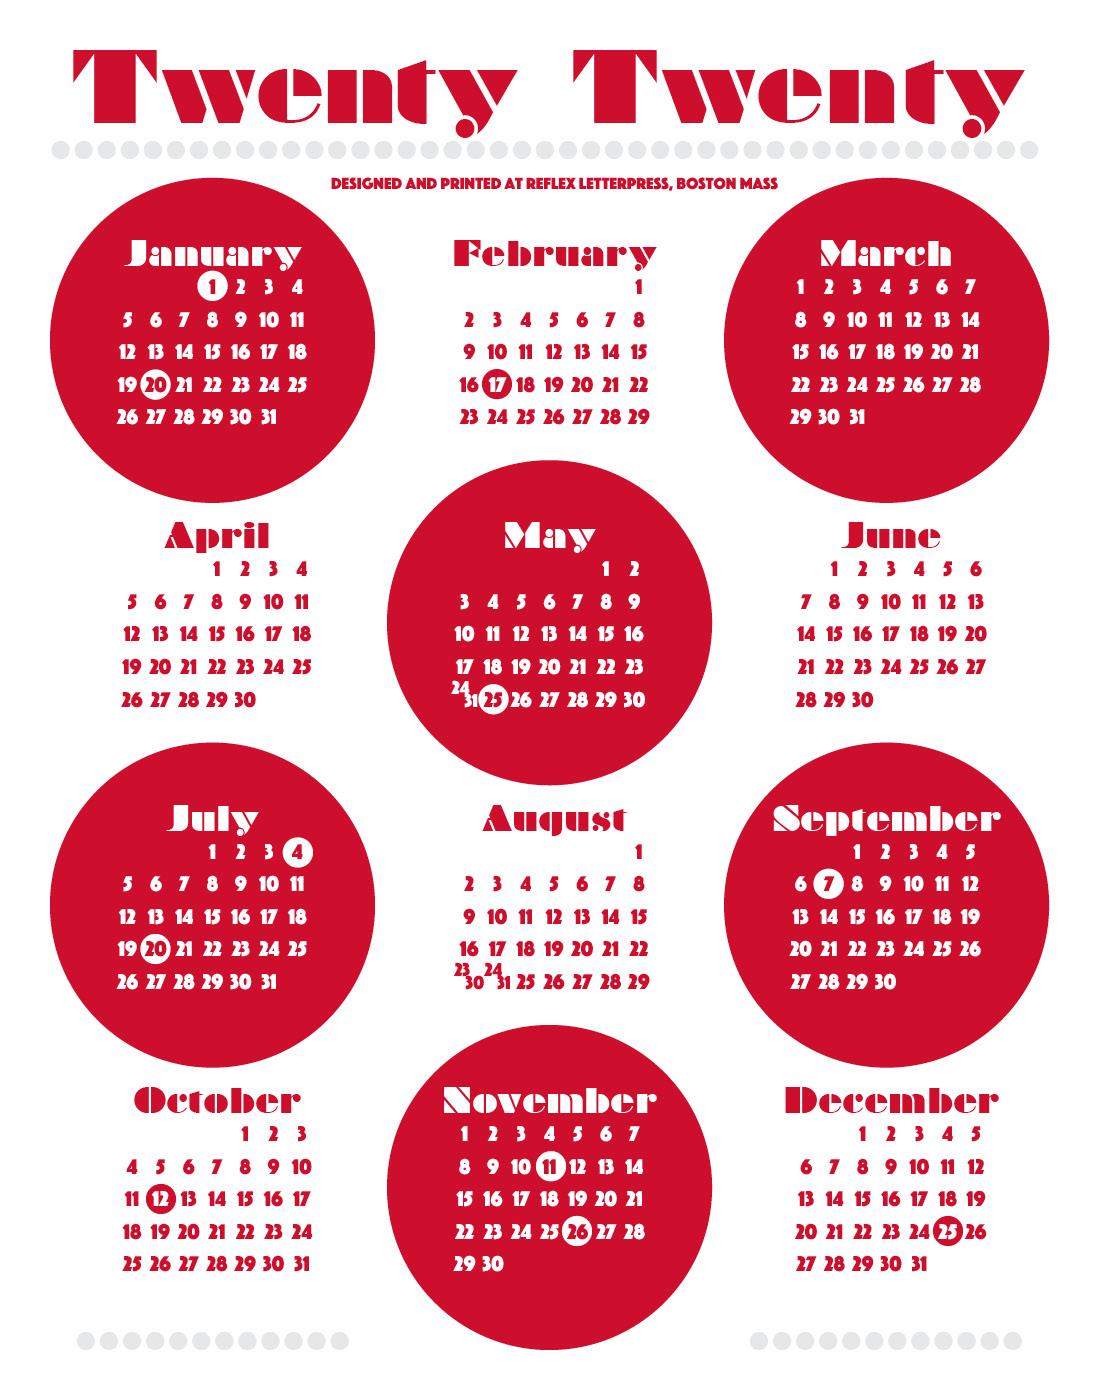 Boston Calendar February 2020 2020 Dot Calendar – Reflex Letterpress